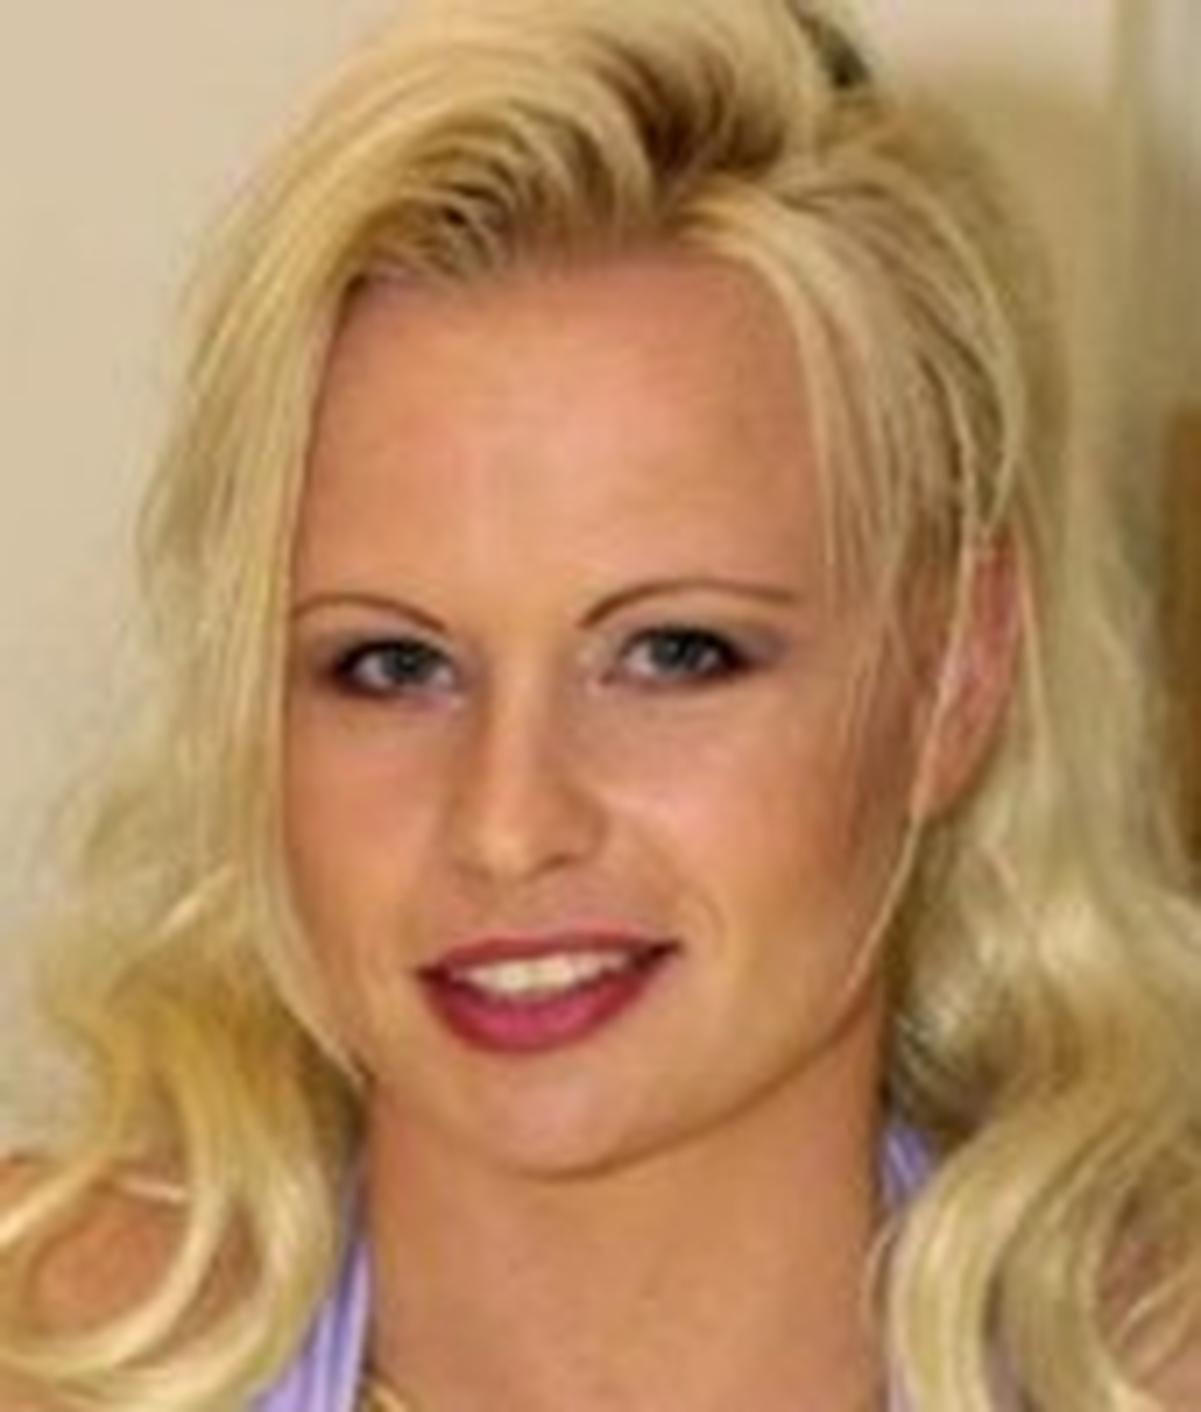 Ingrid Swede | Wiki & Bio | Everipedia